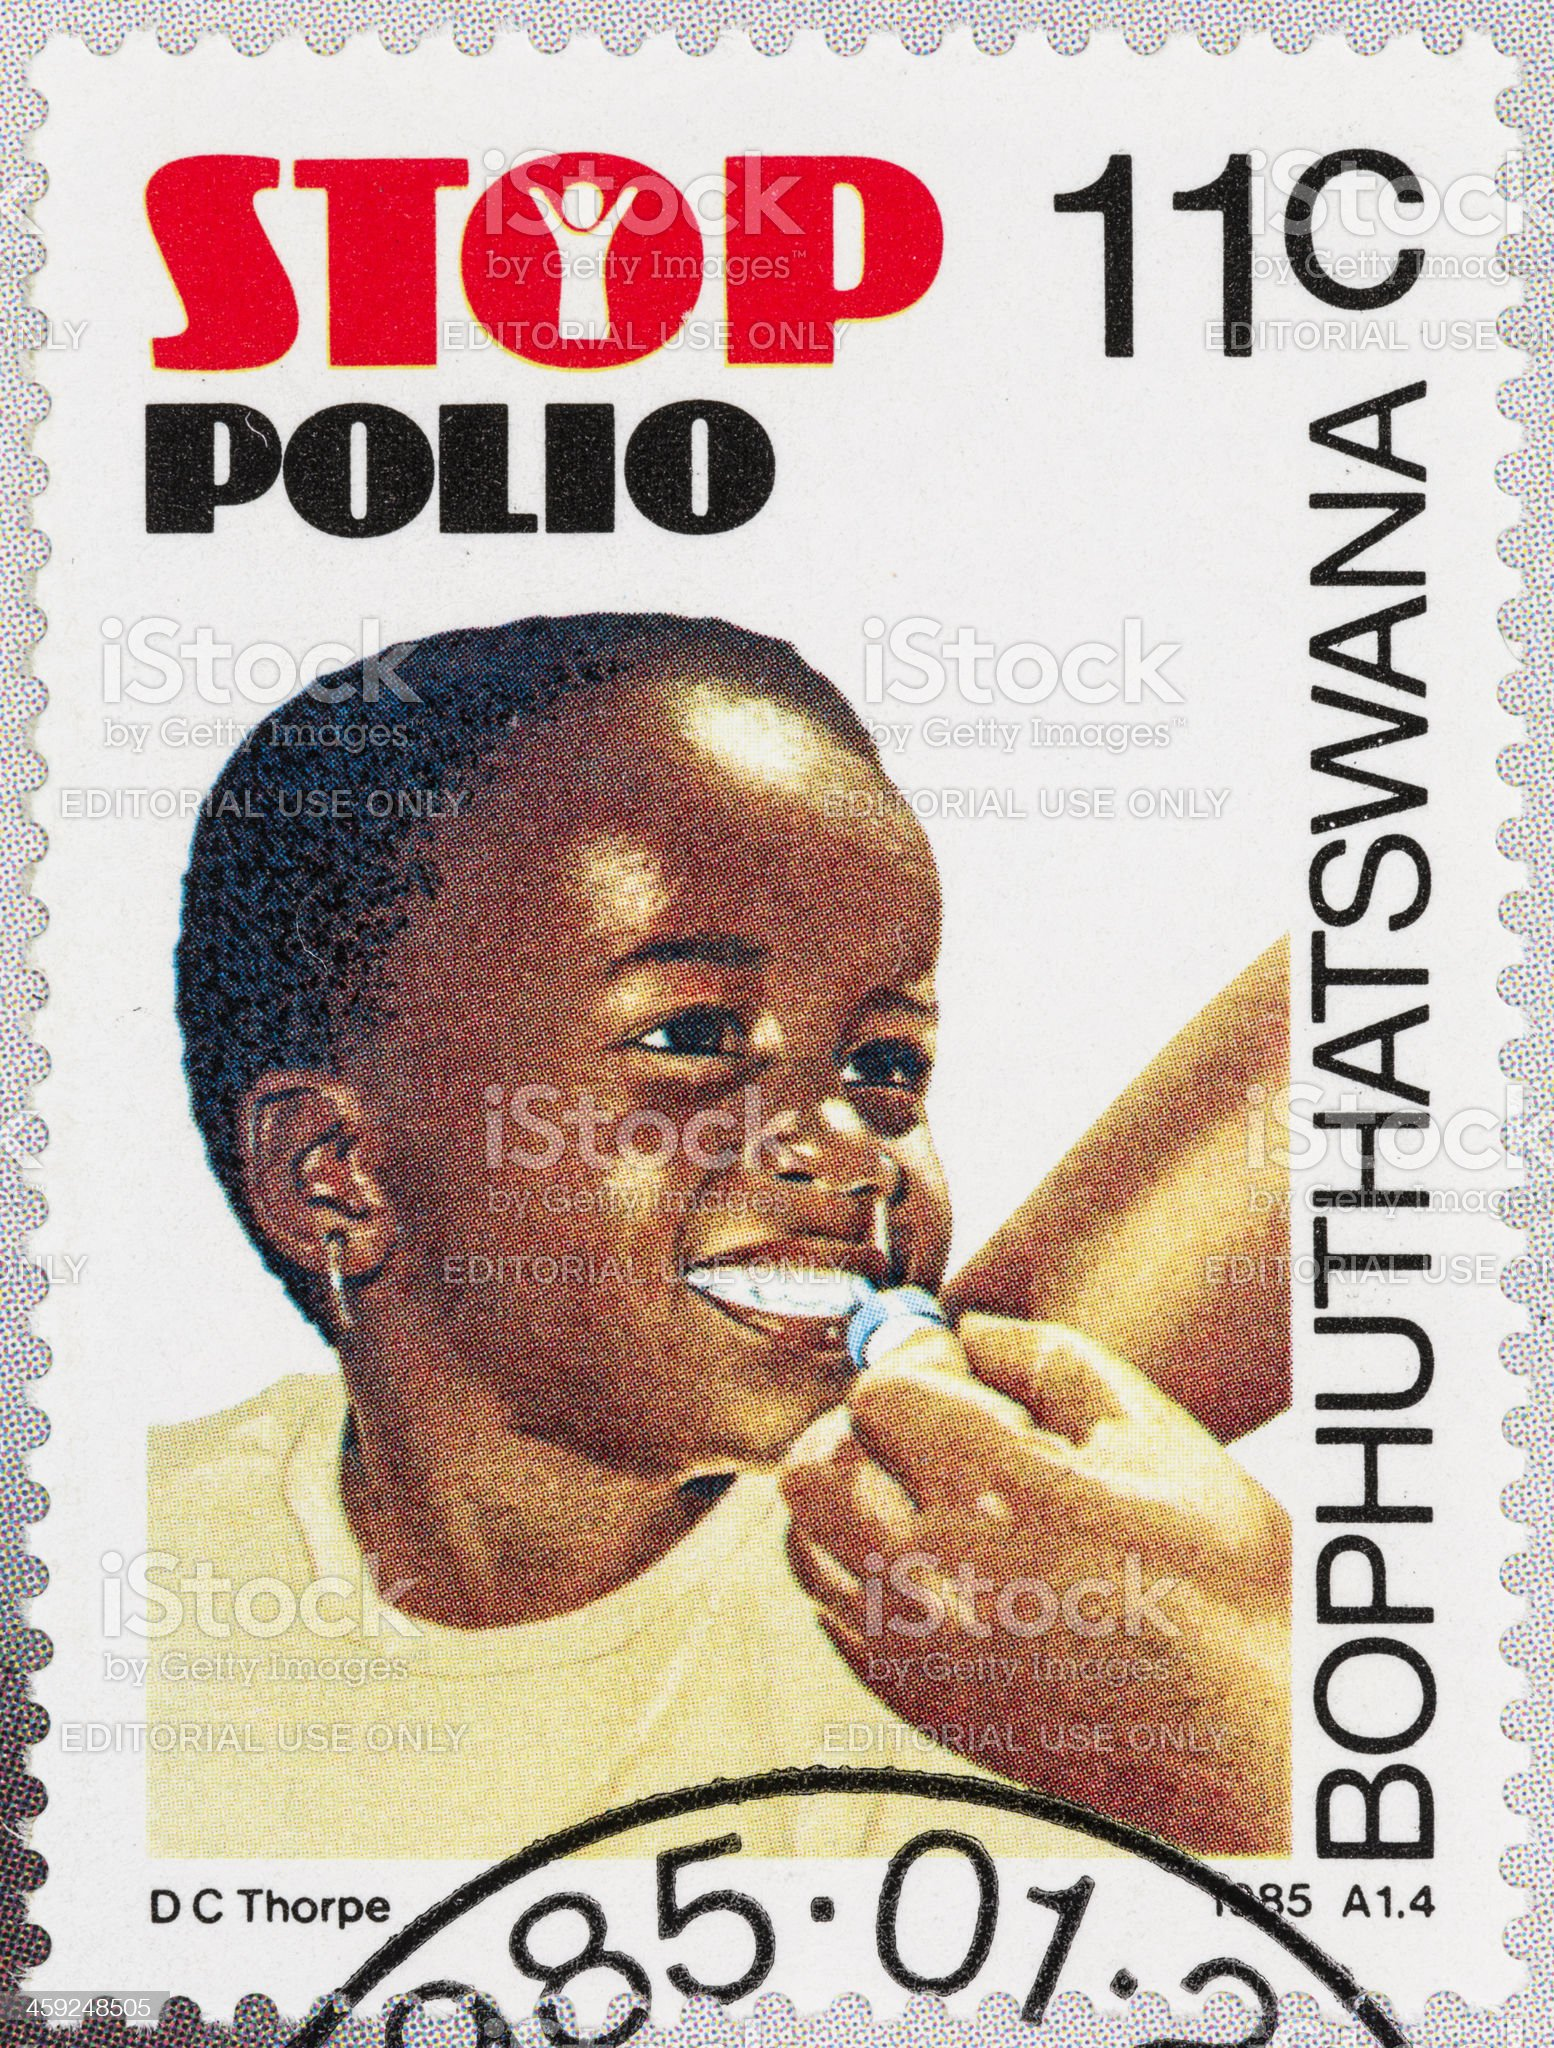 Bophuthatswana stop polio  postage stamp royalty-free stock photo